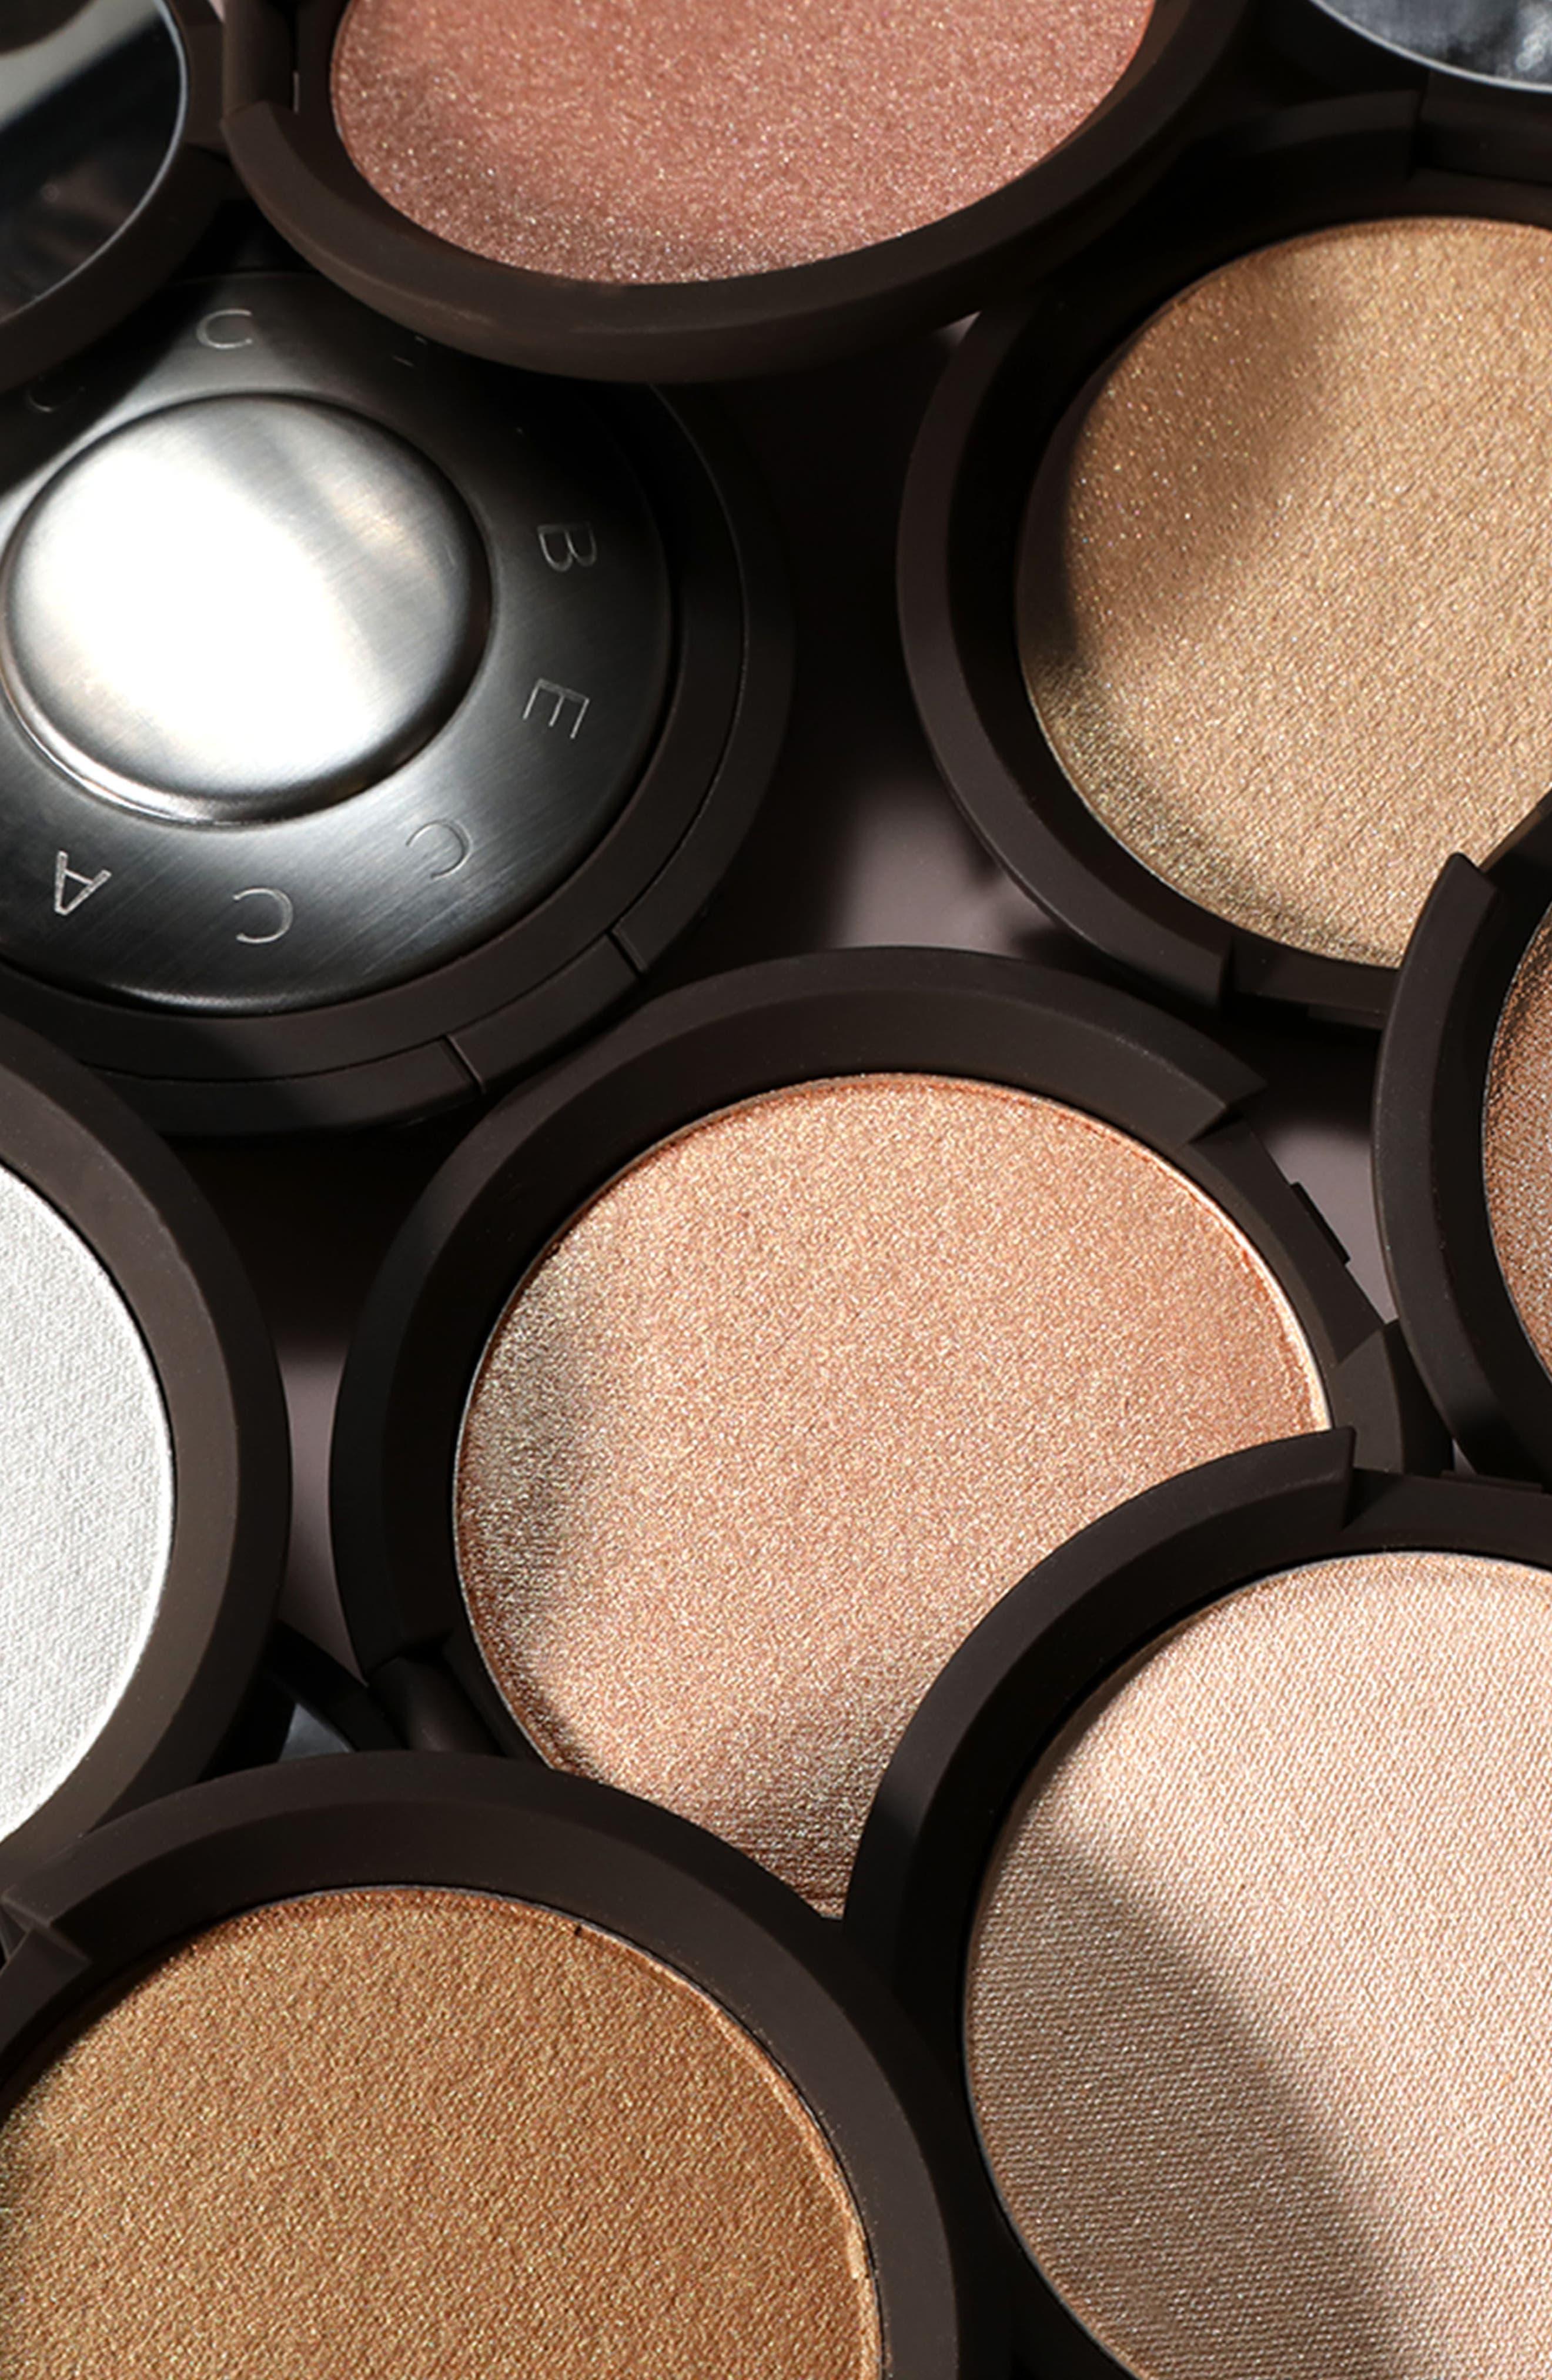 BECCA Shimmering Skin Perfector Pressed Highlighter,                             Alternate thumbnail 9, color,